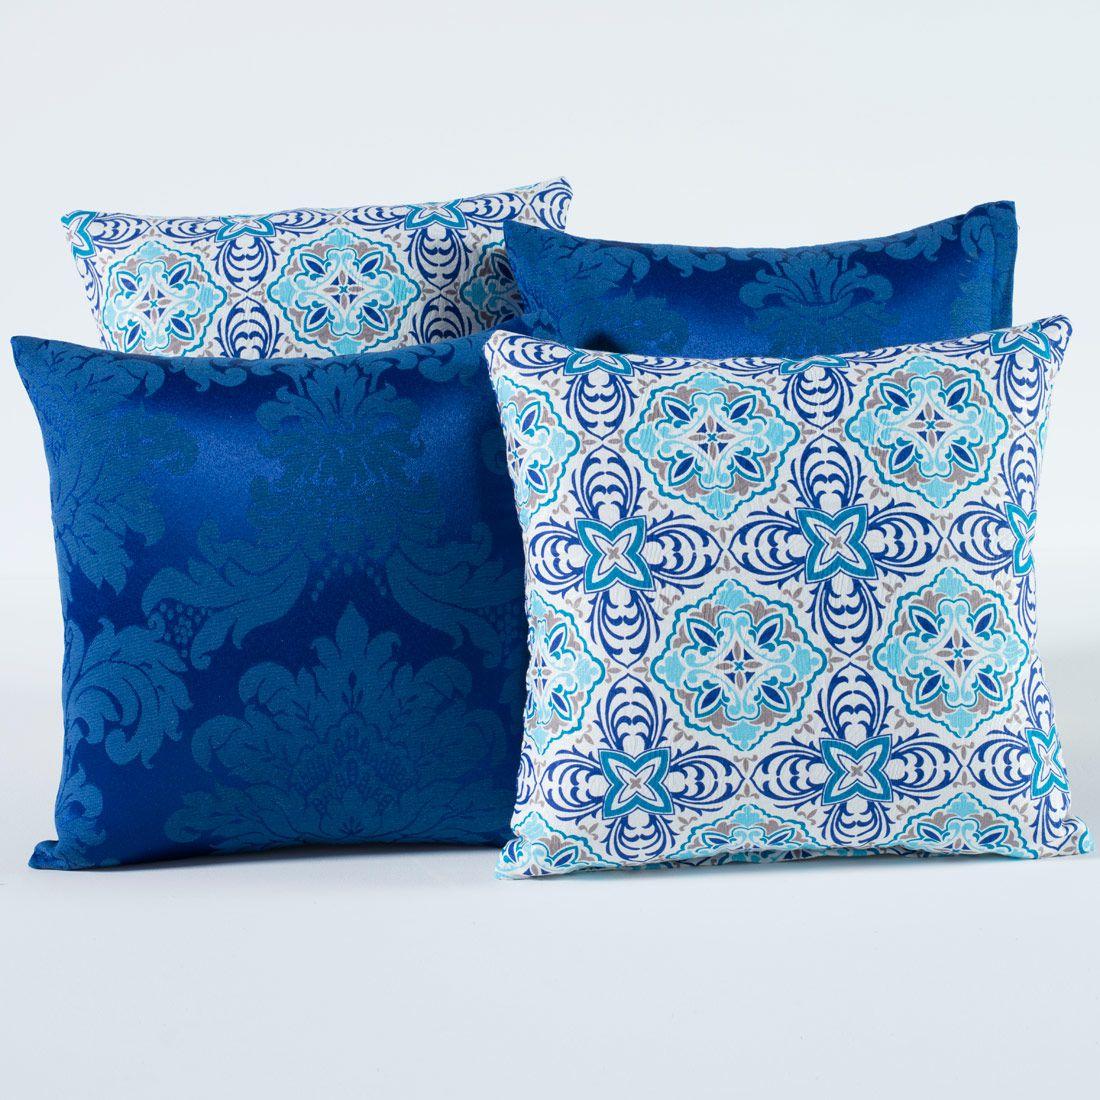 Kit c/ 4 Almofadas Cheias Decorativas Mandala Azul Royal 04 Peças c/ Refil